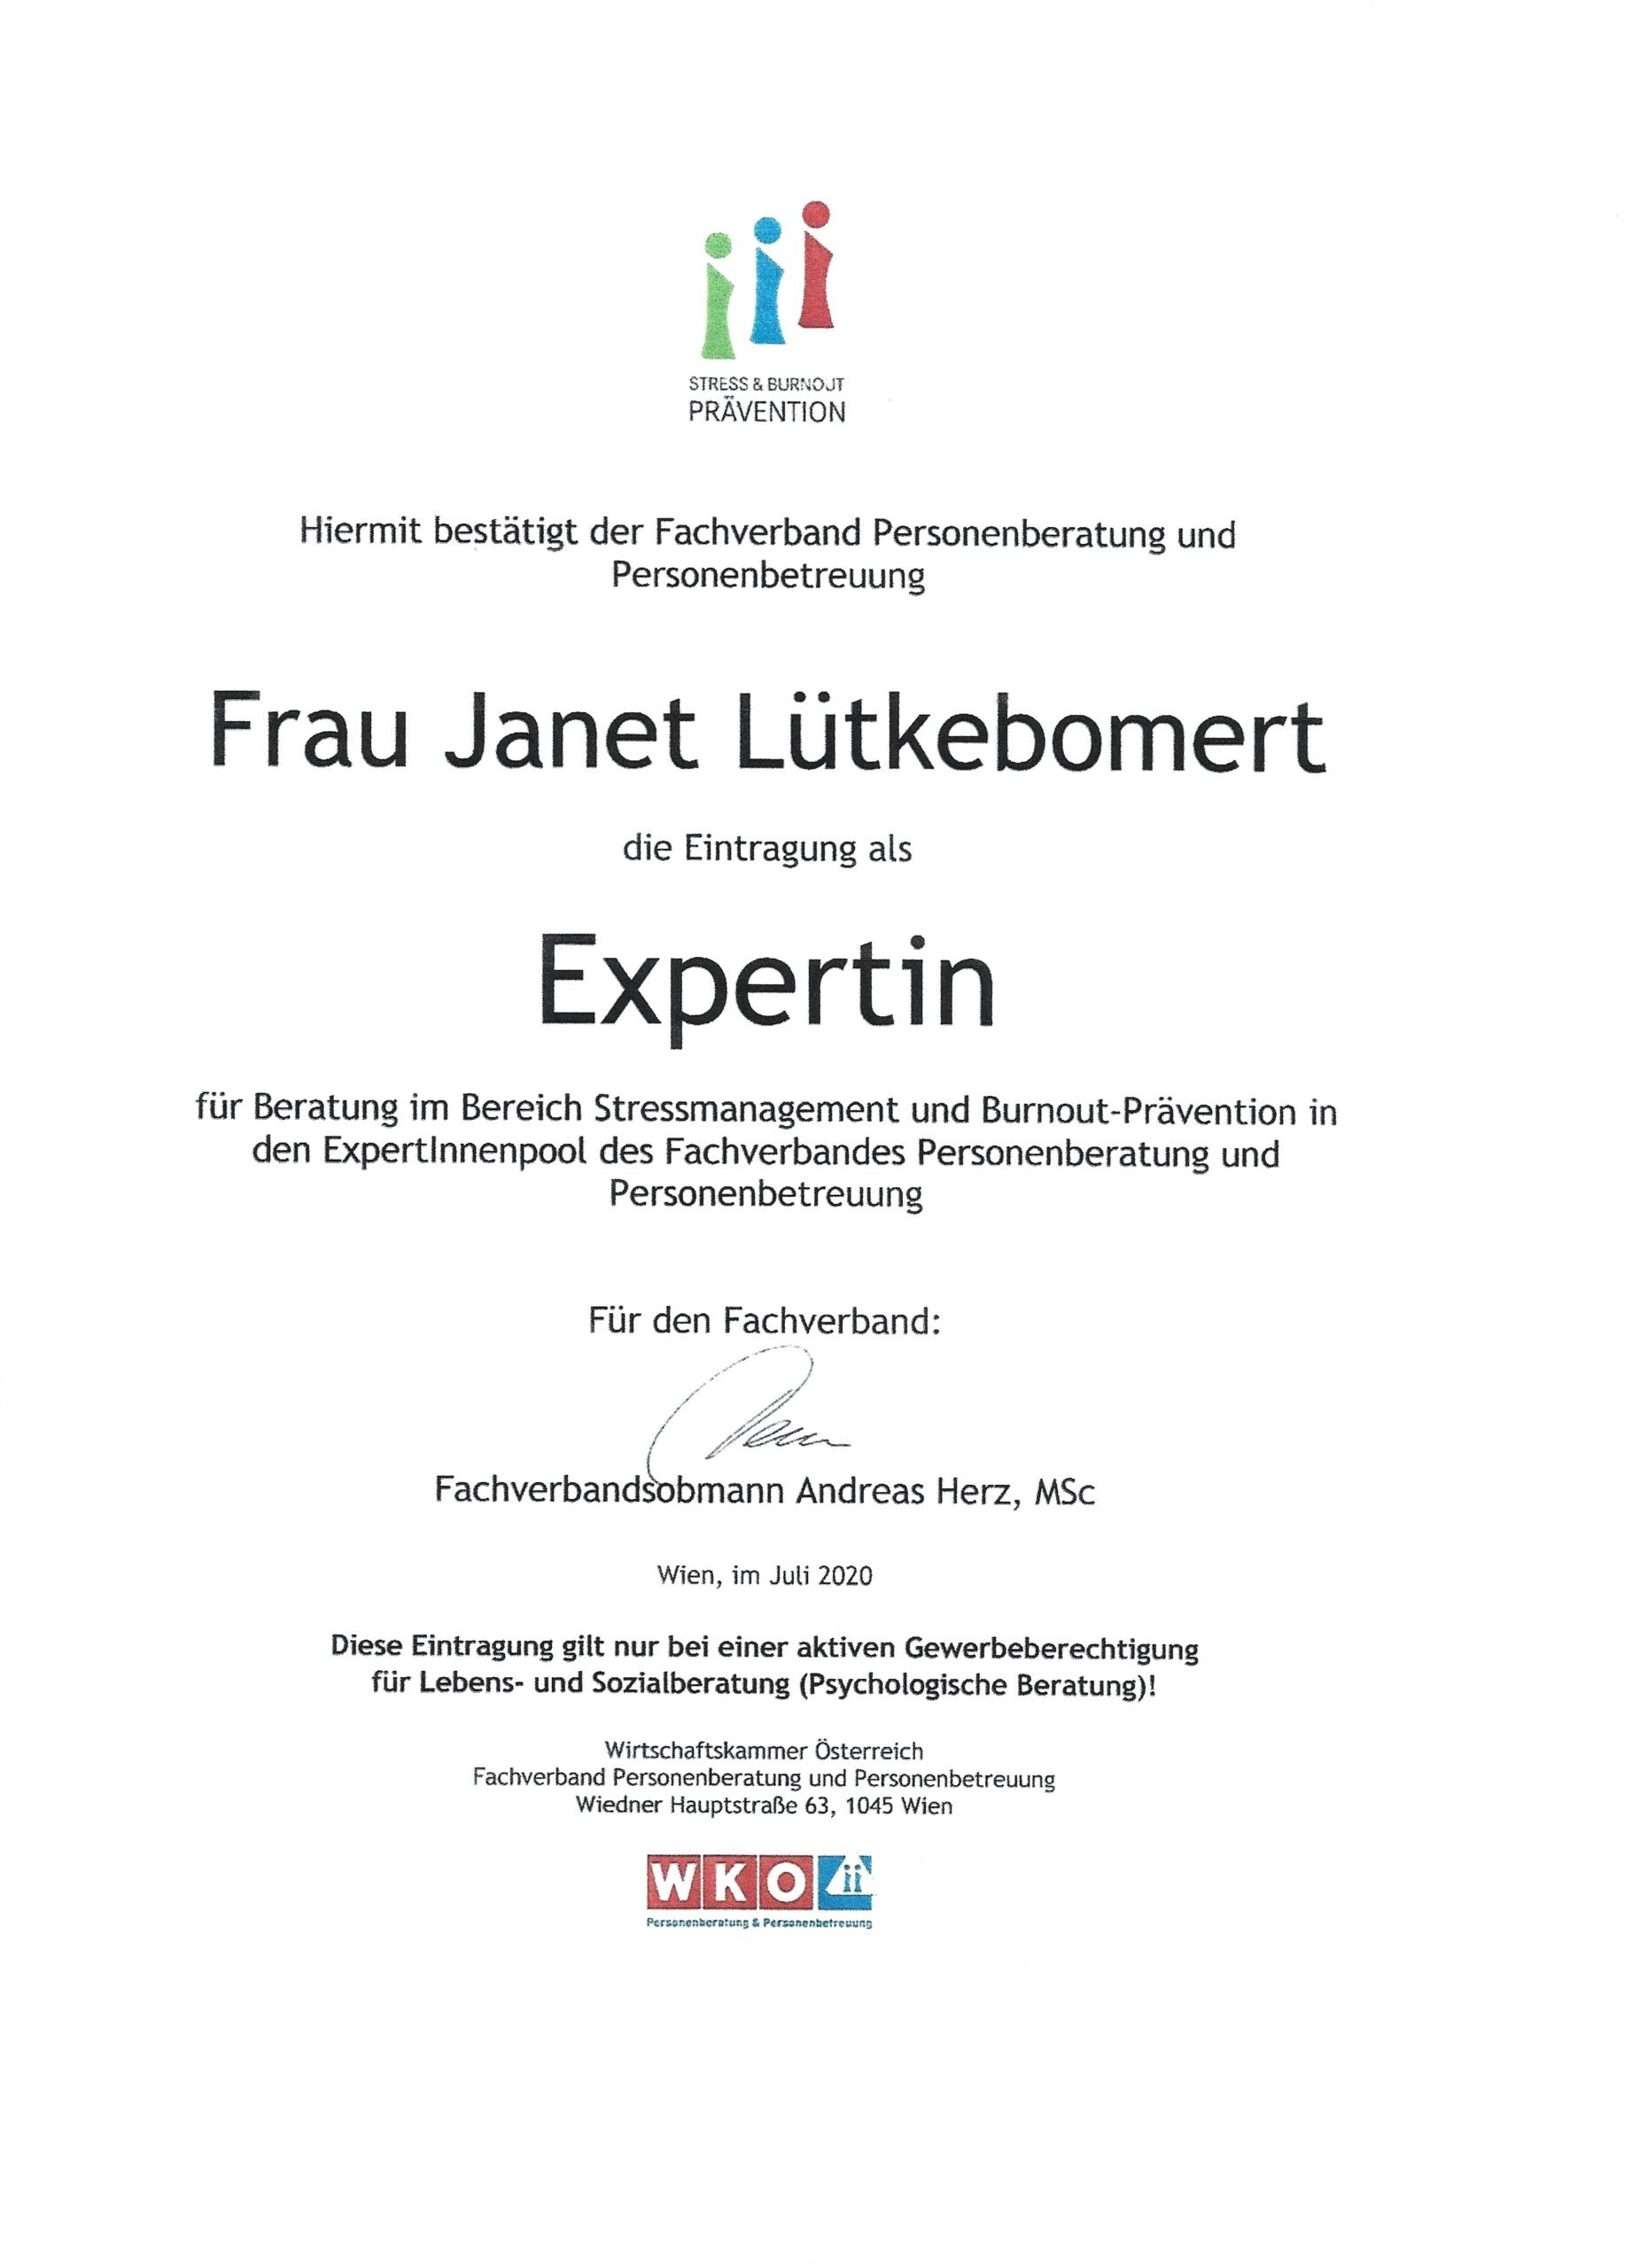 Expertin Stressmanagement & Burnout-Prävention